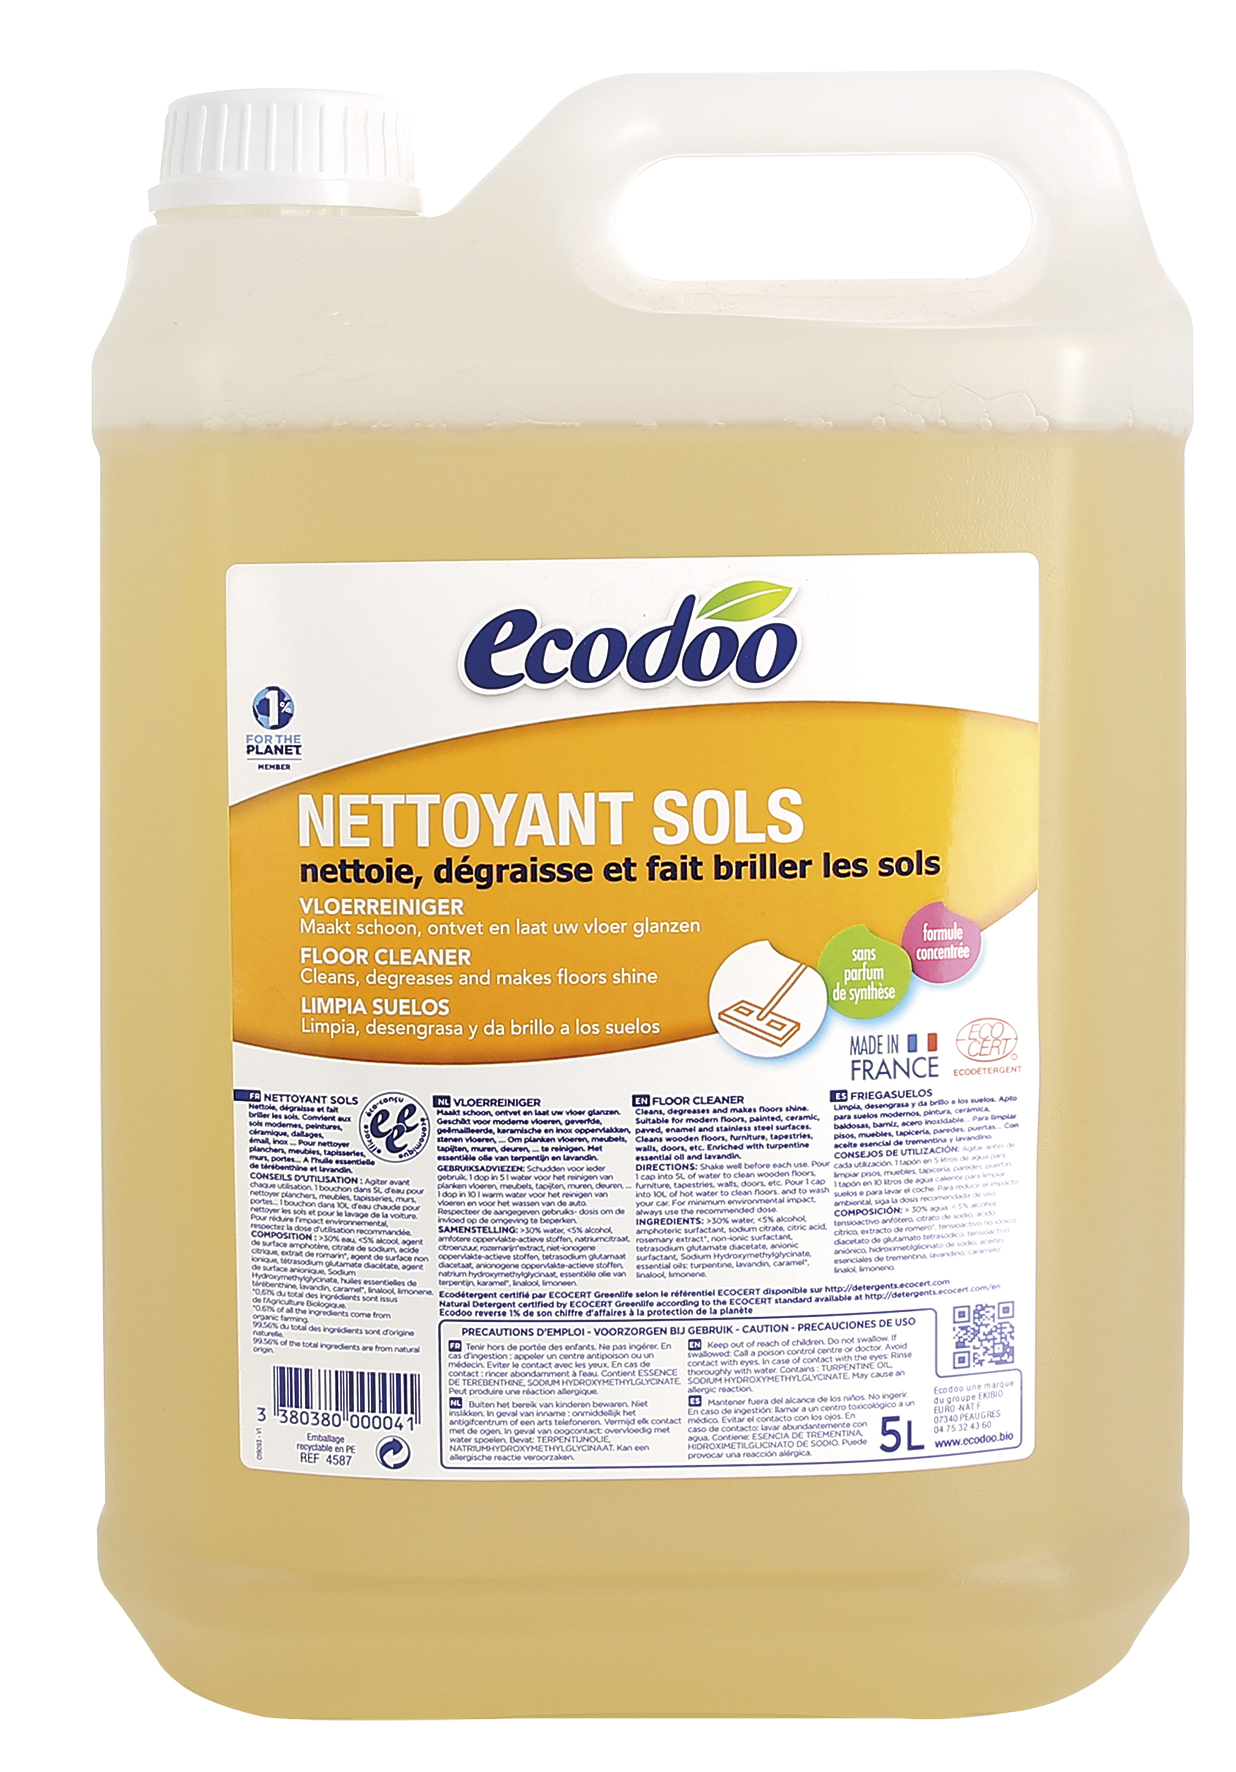 Nettoyant sols, Ecodoo (5 l)